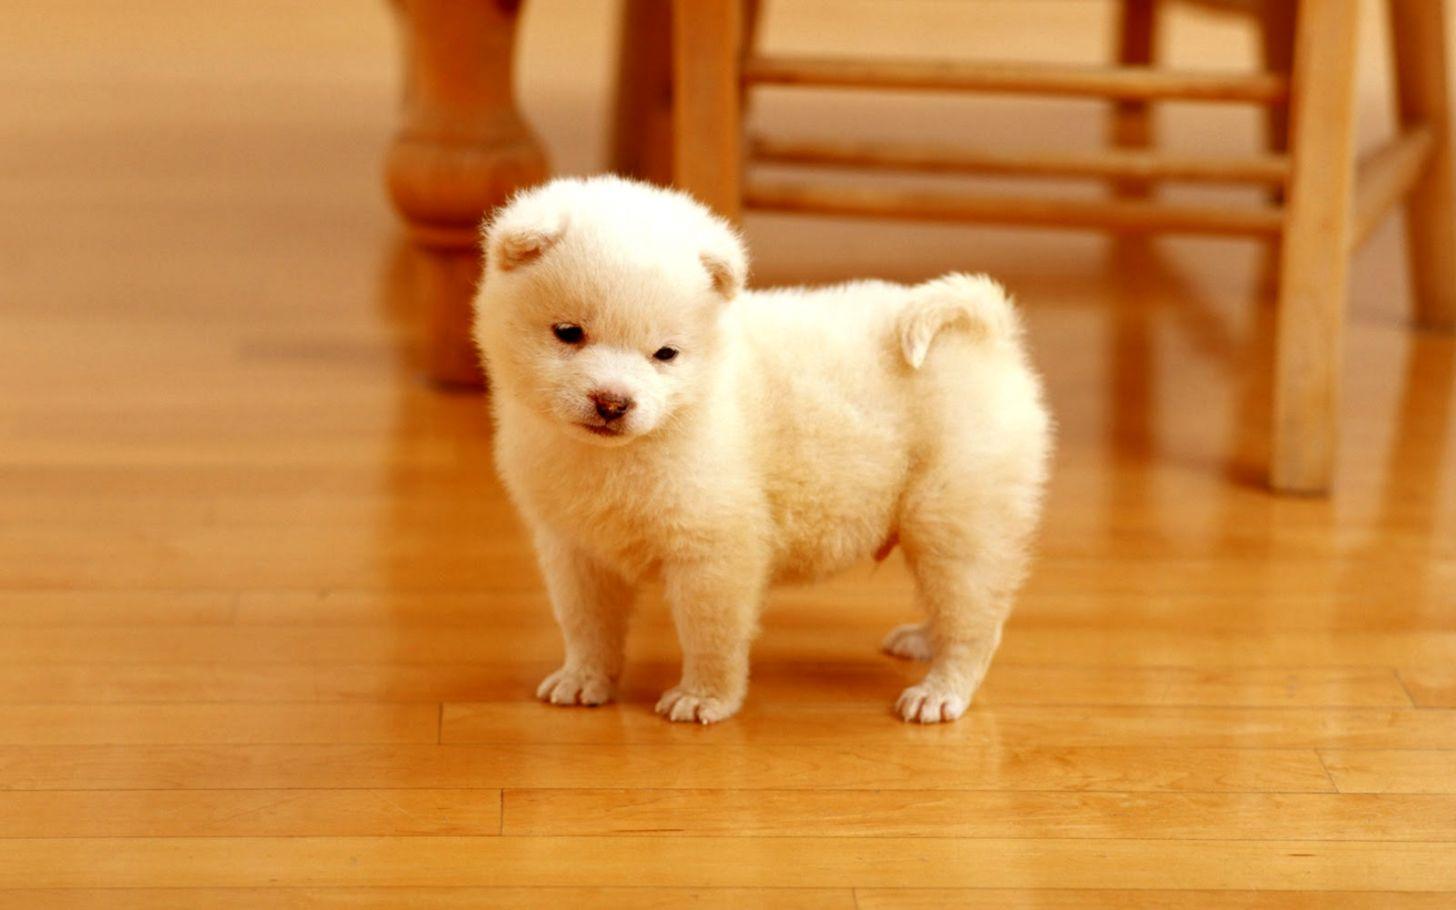 Ilmu Pengetahuan 10 Dog Images Free Download Hd